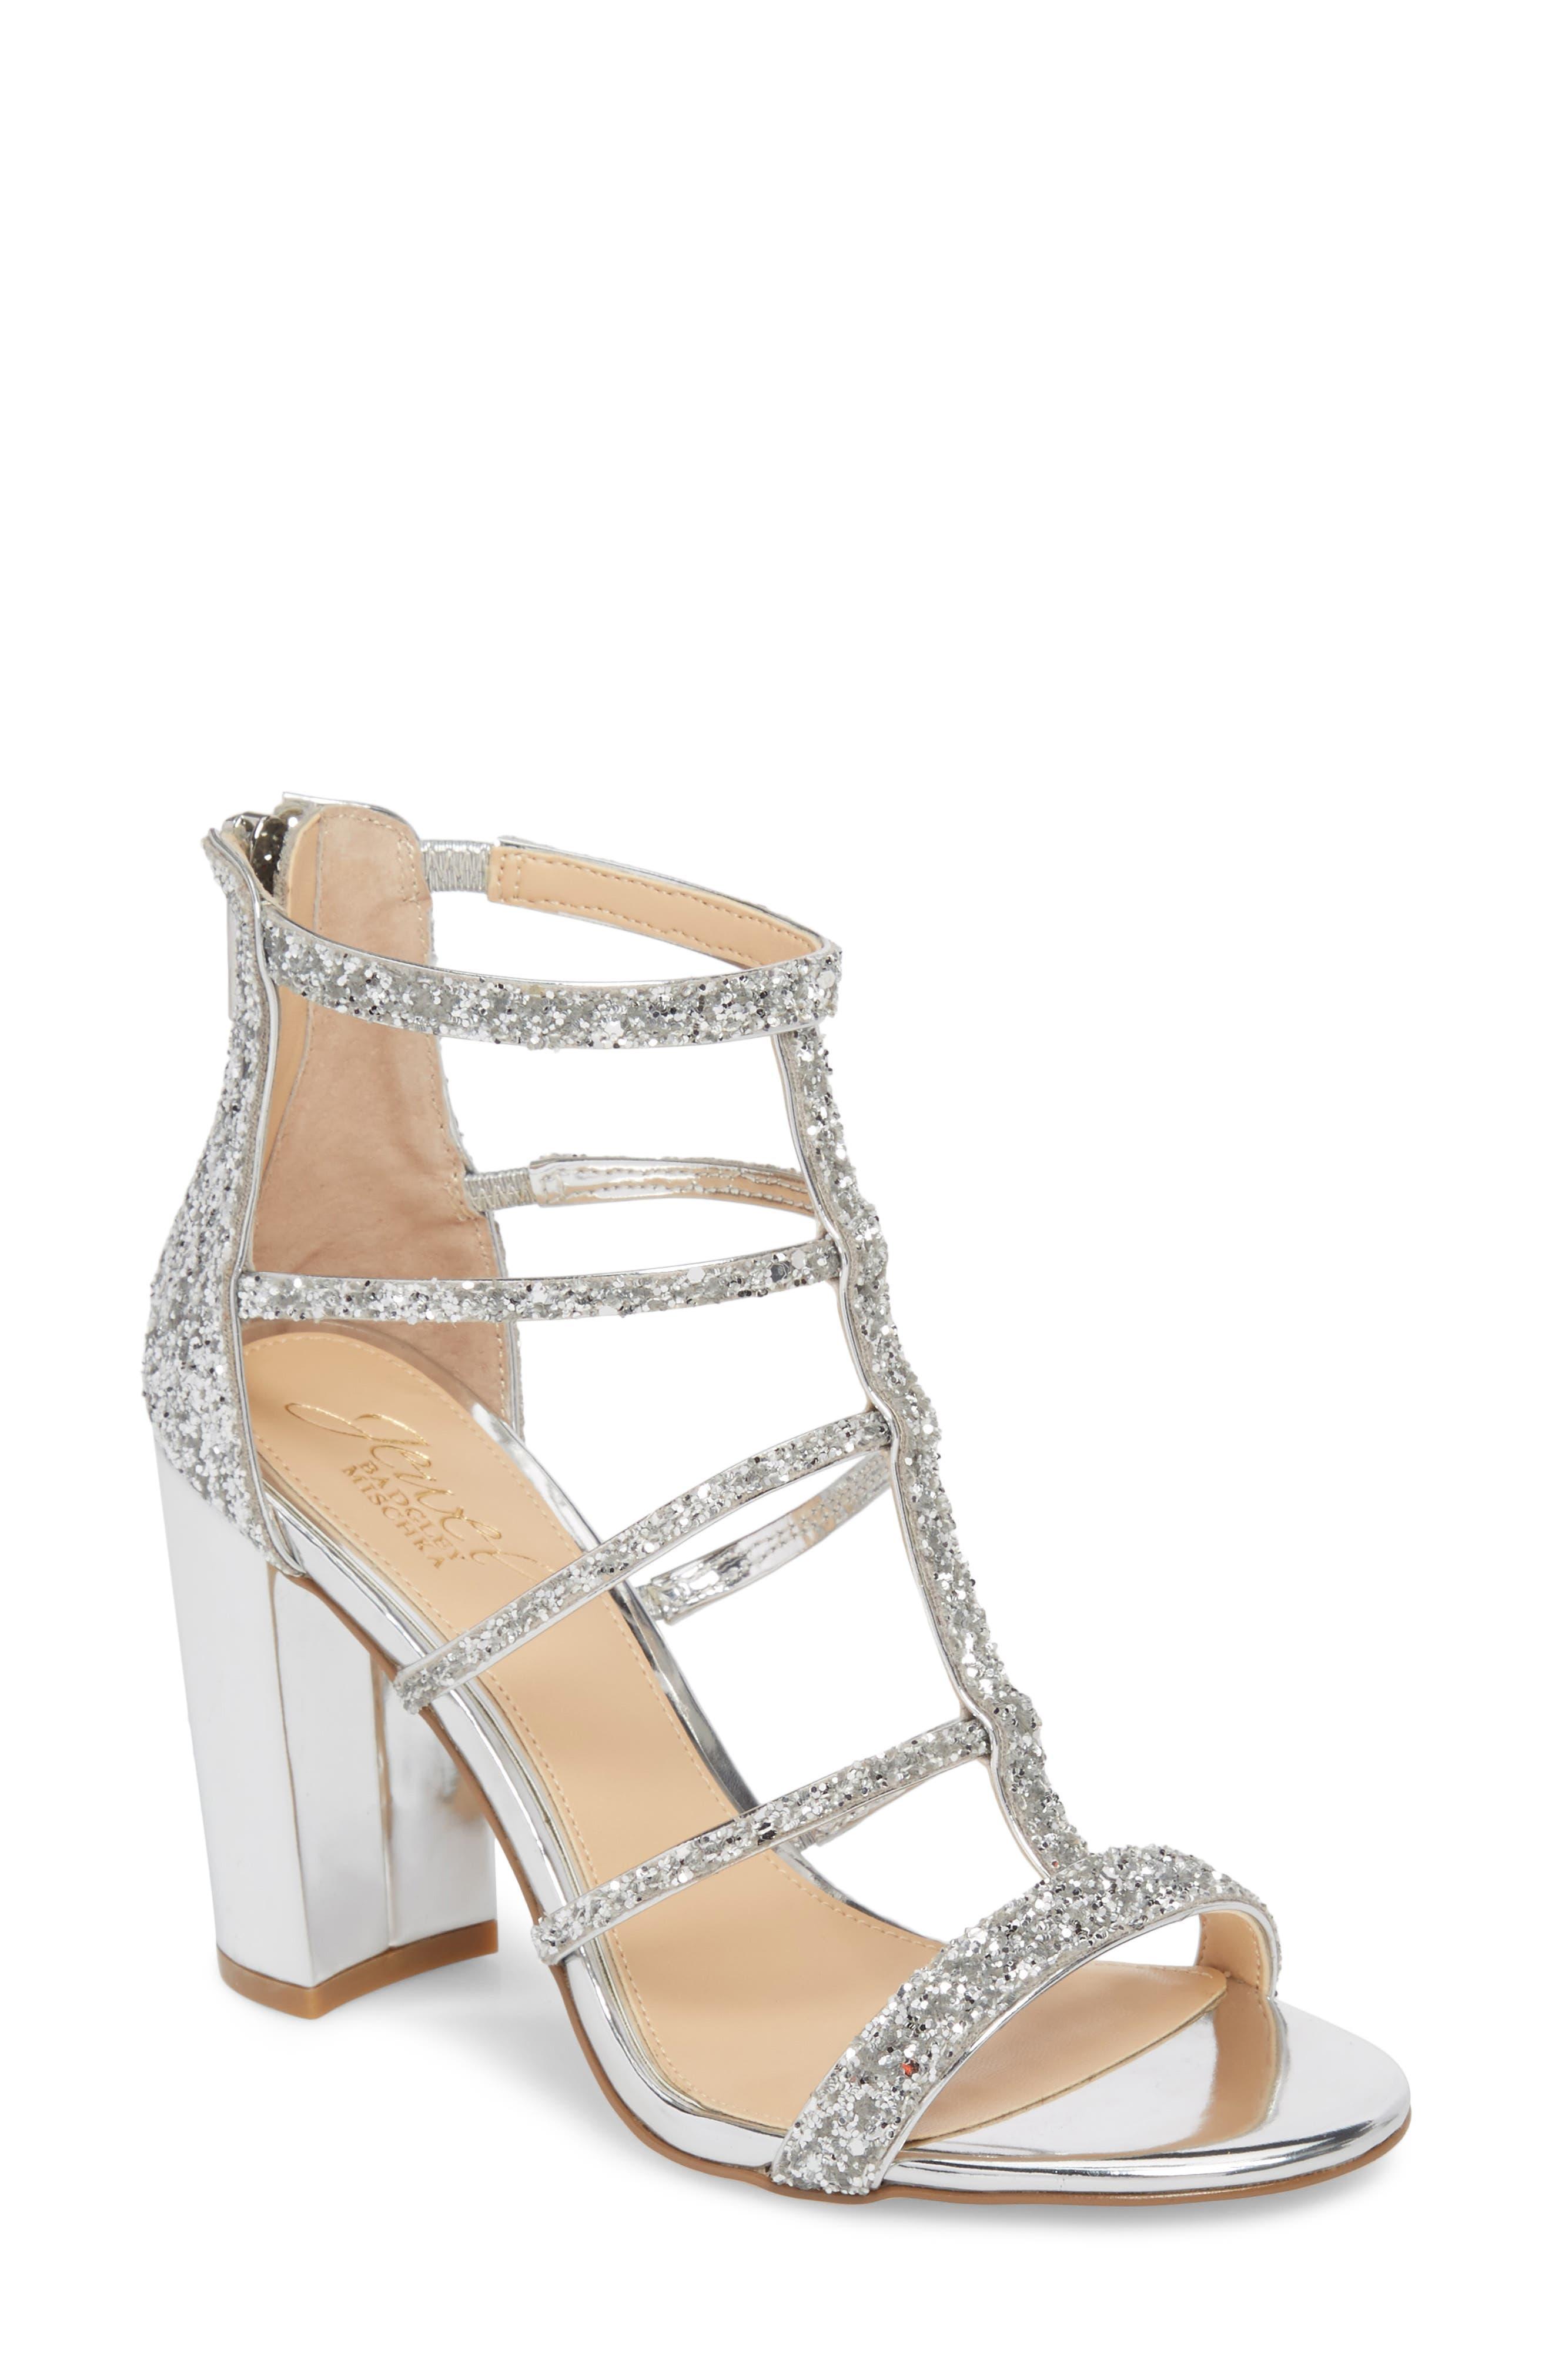 Alternate Image 1 Selected - Jewel Badgley Mischka Tiffy Glitter Sandal (Women)